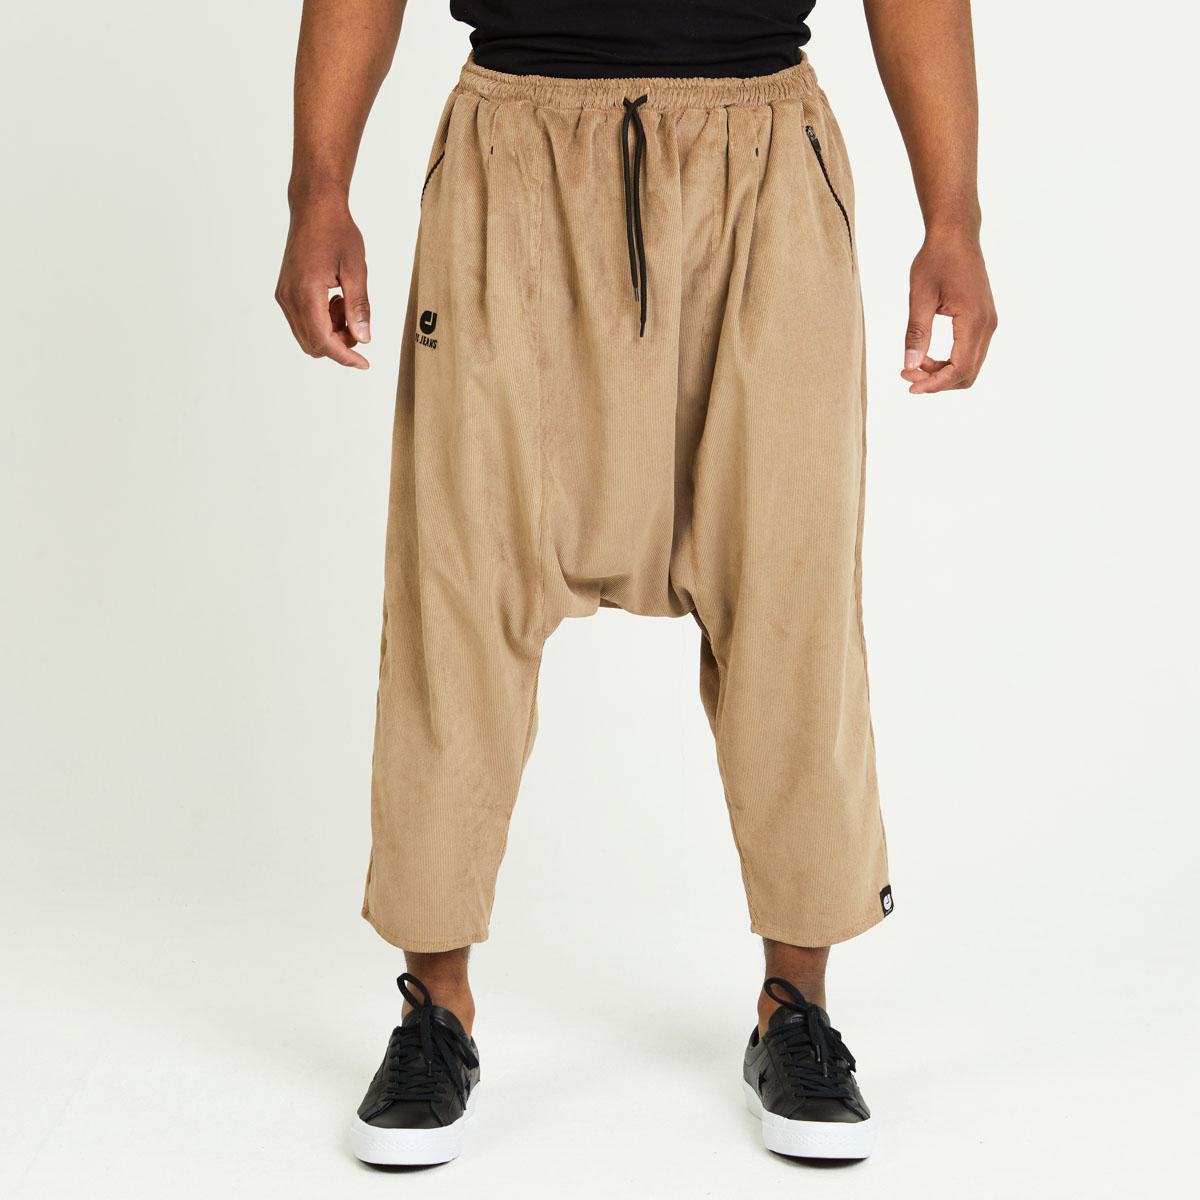 15ead81e94ea4 Saroual Classic GAT Beige - DCJeans ® - sarouel & clothing - site ...